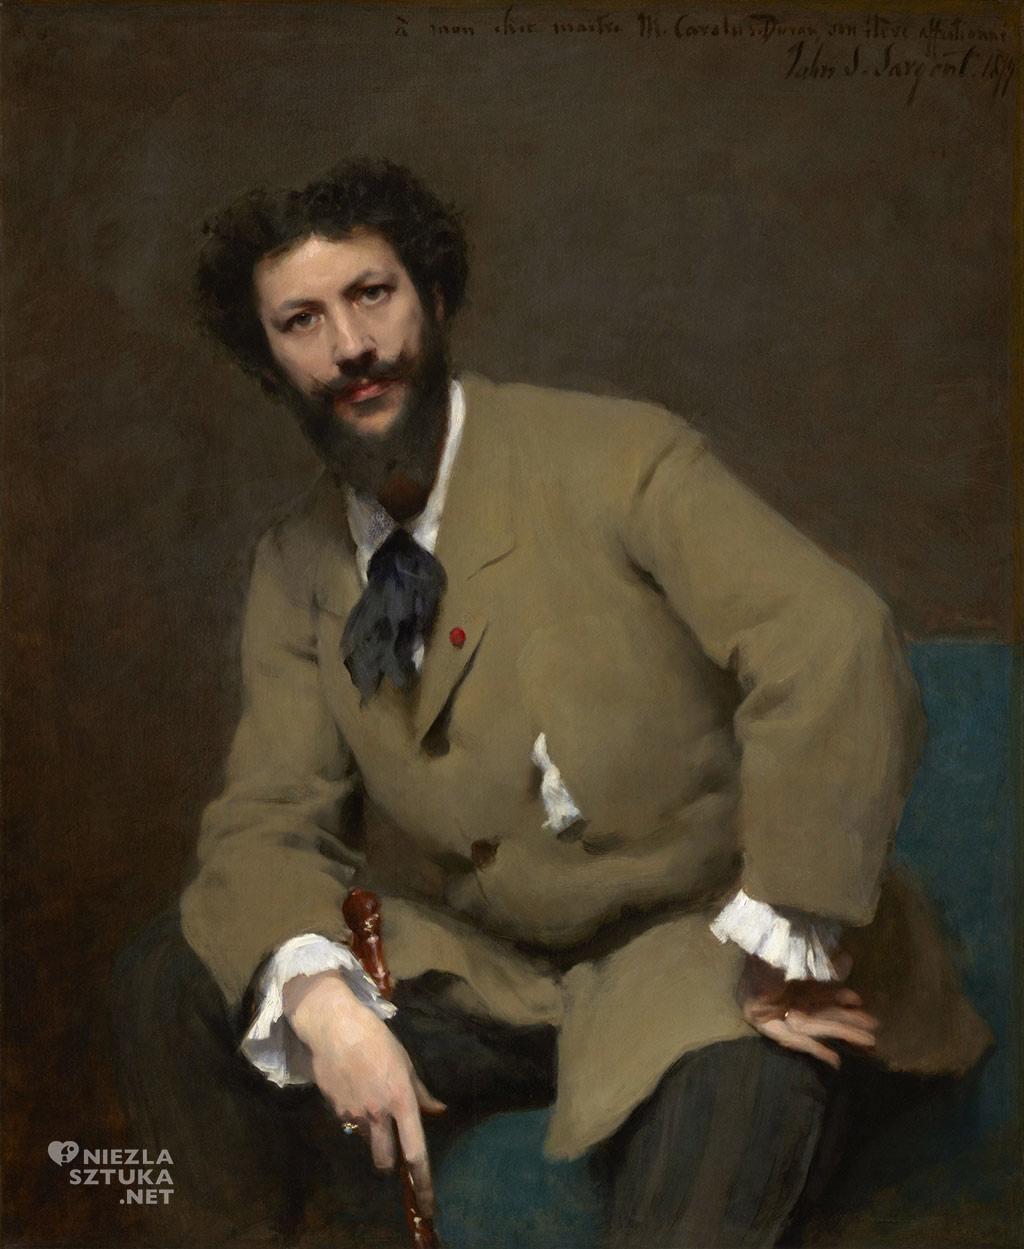 John Singer Sargent, Carolus-Duran, Charles-Emile-Auguste Durand, Niezła sztuka